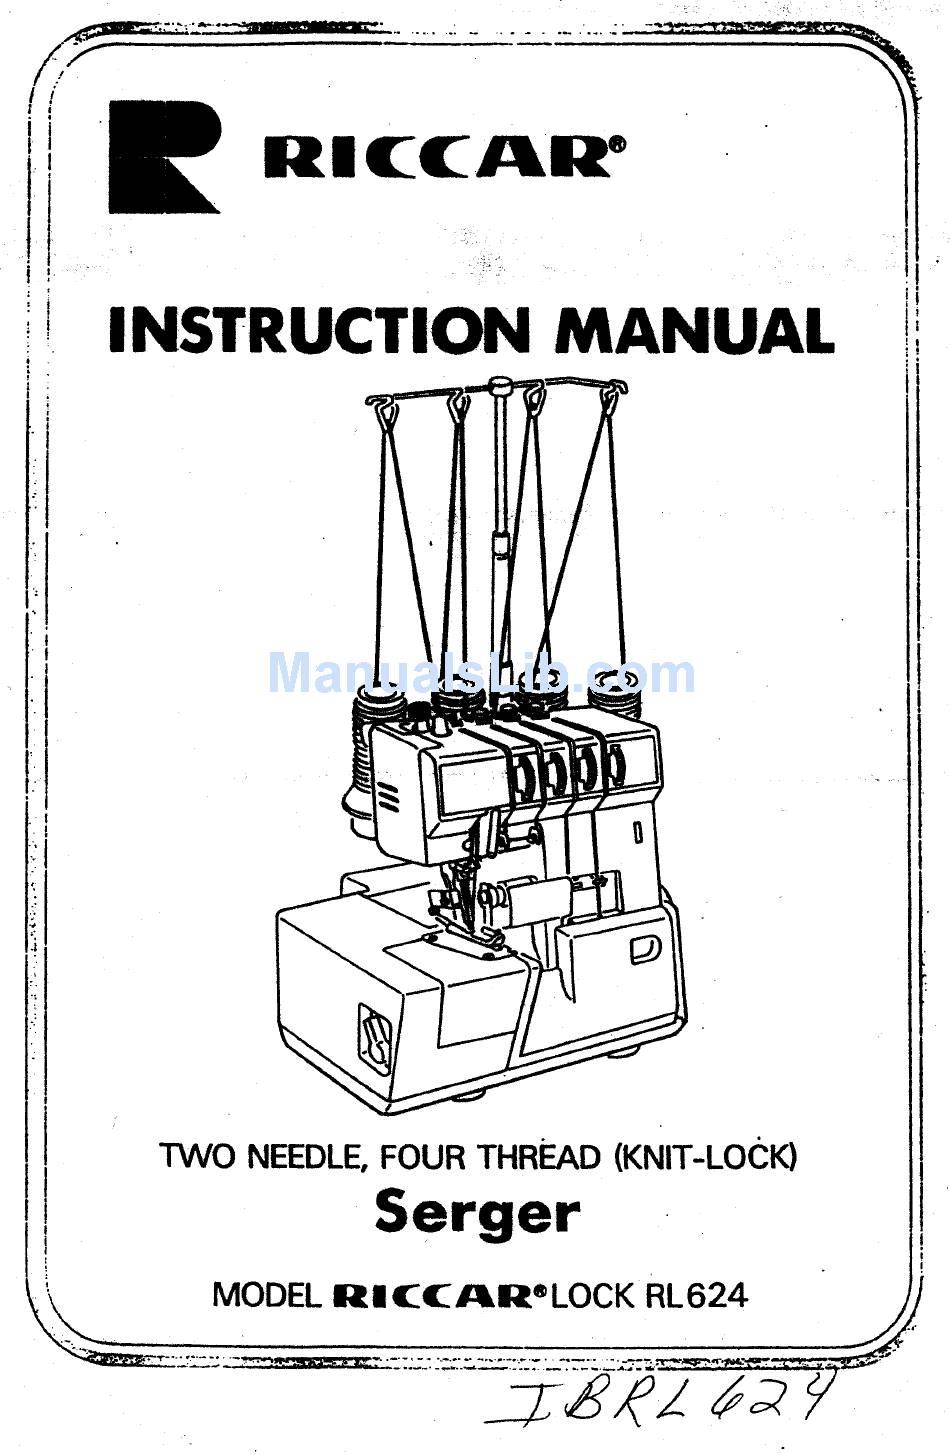 Ar15a2 Upper Recv Accessories Manual Guide